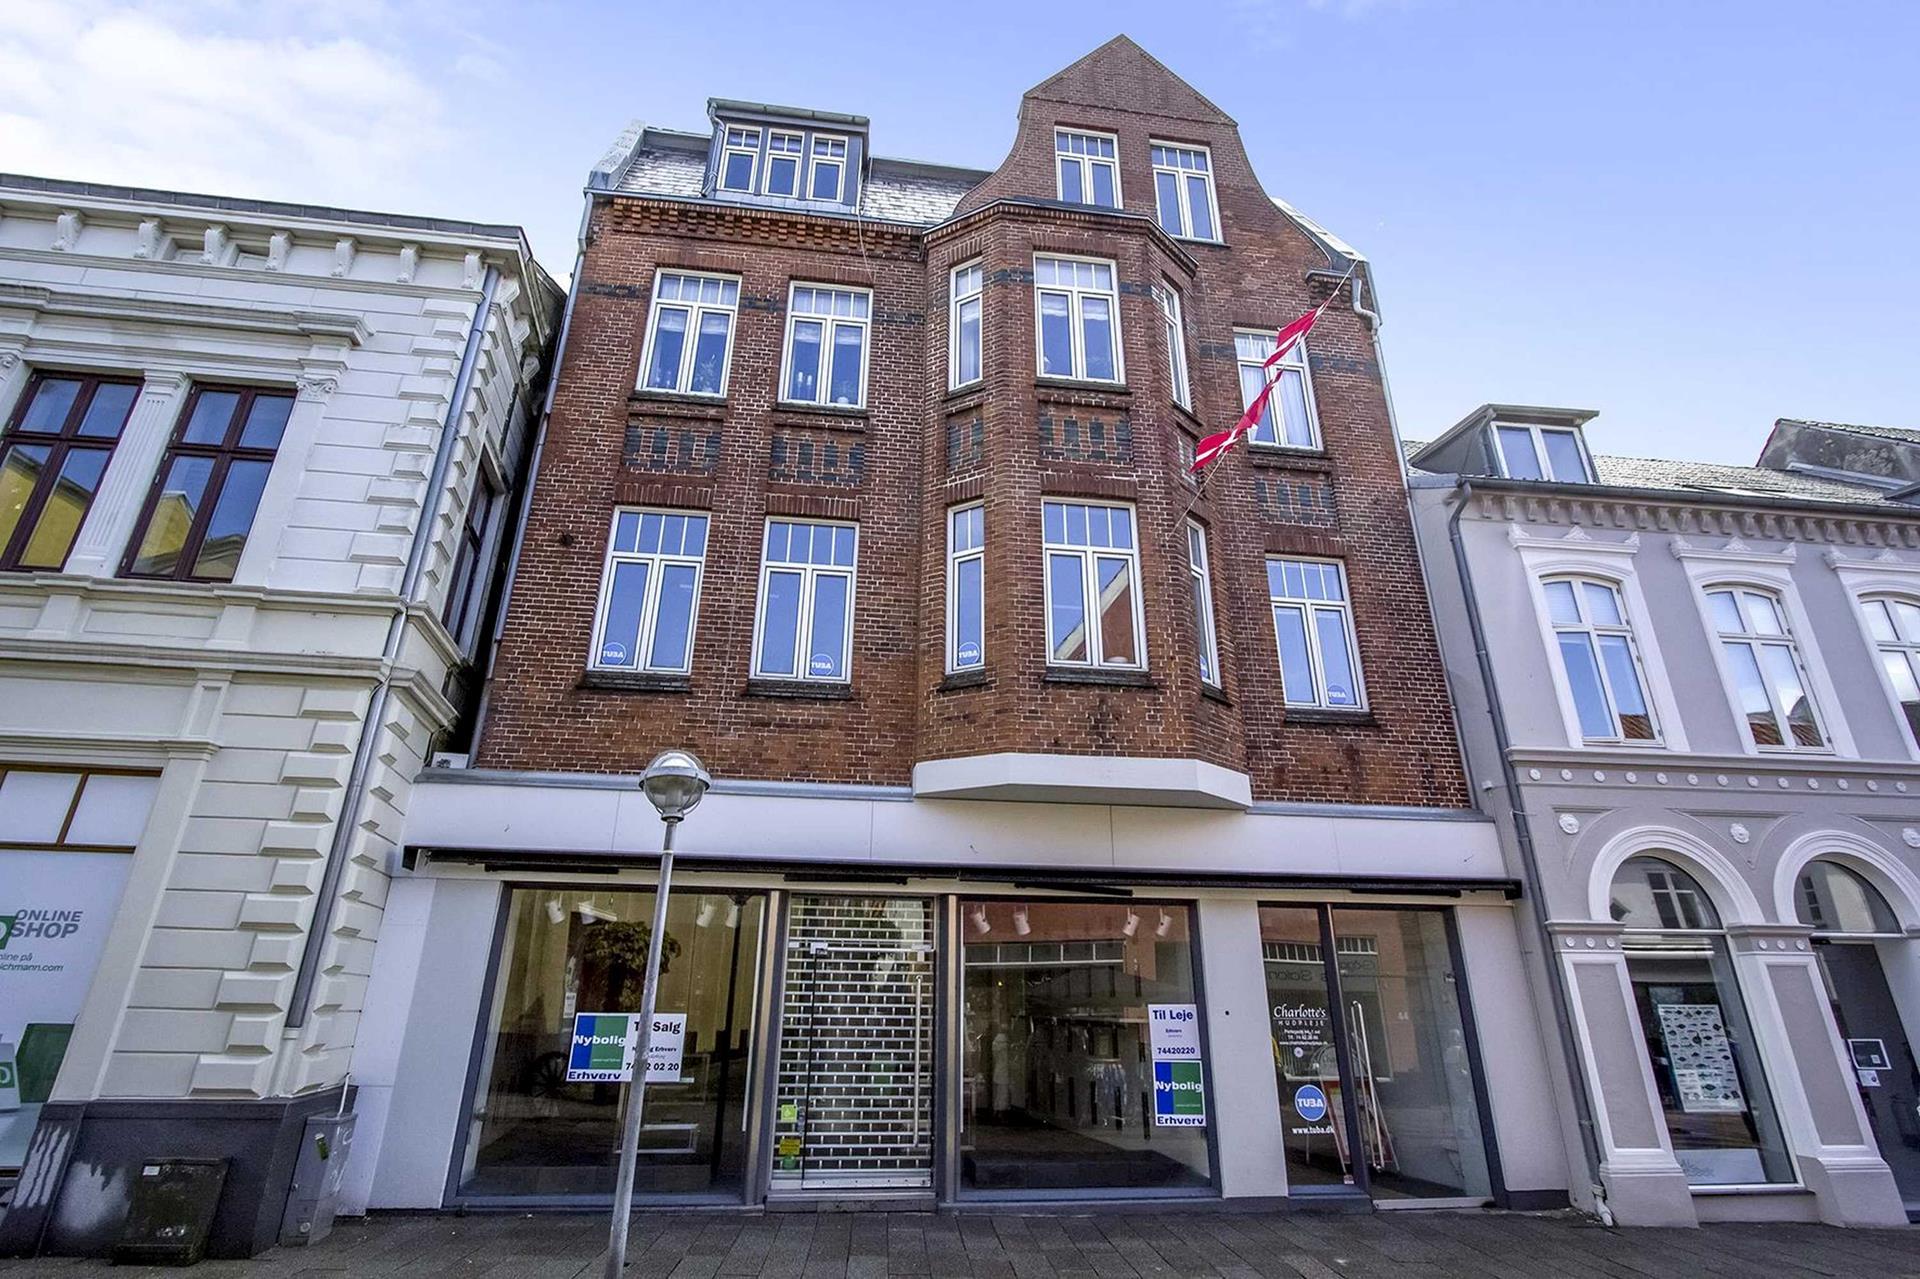 Bolig/erhverv på Perlegade i Sønderborg - Facade